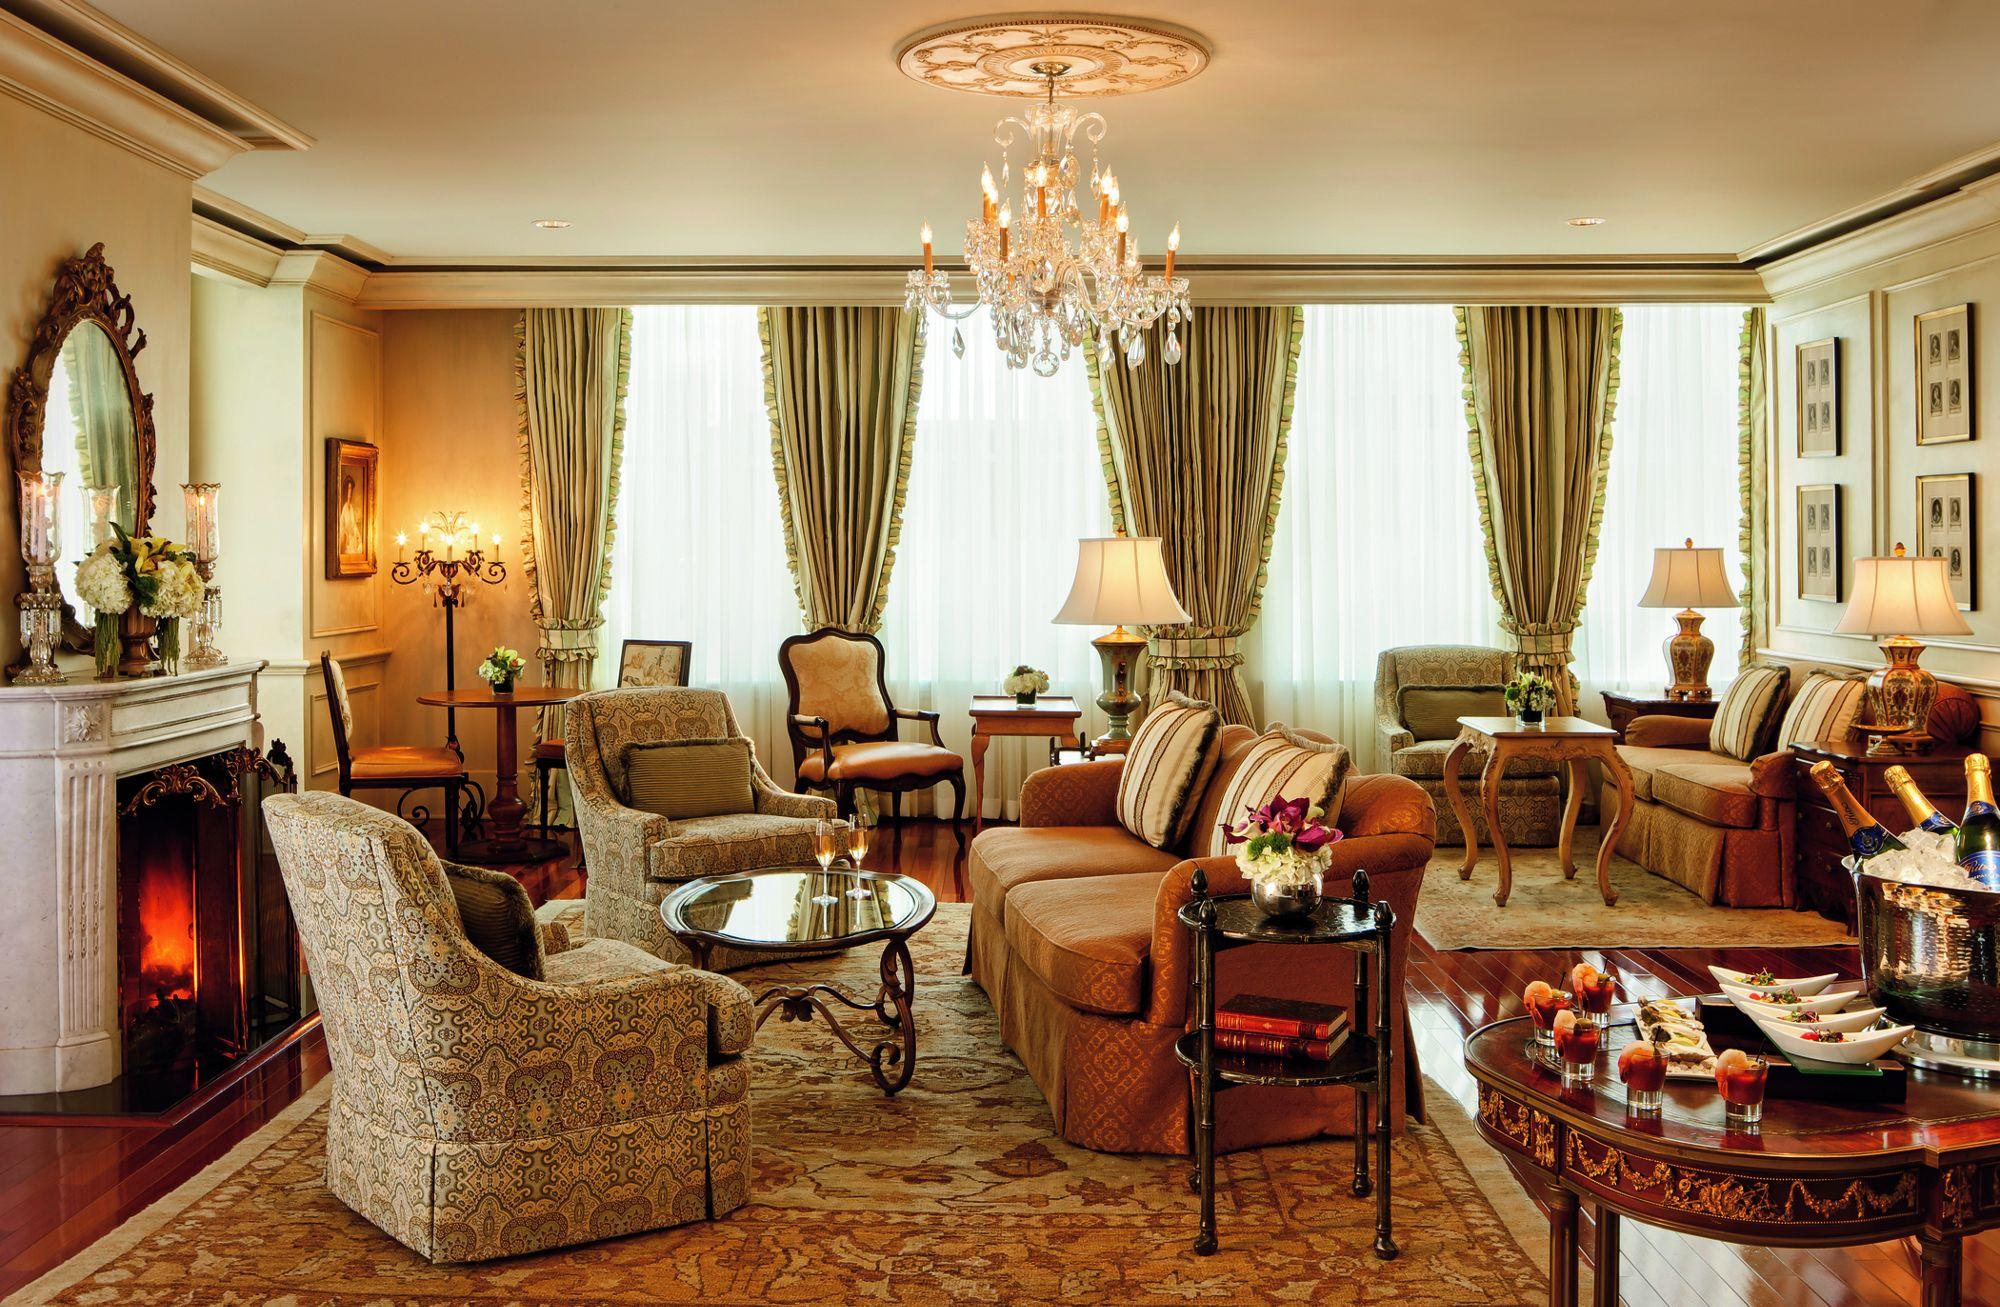 The Ritz Carlton Lounge